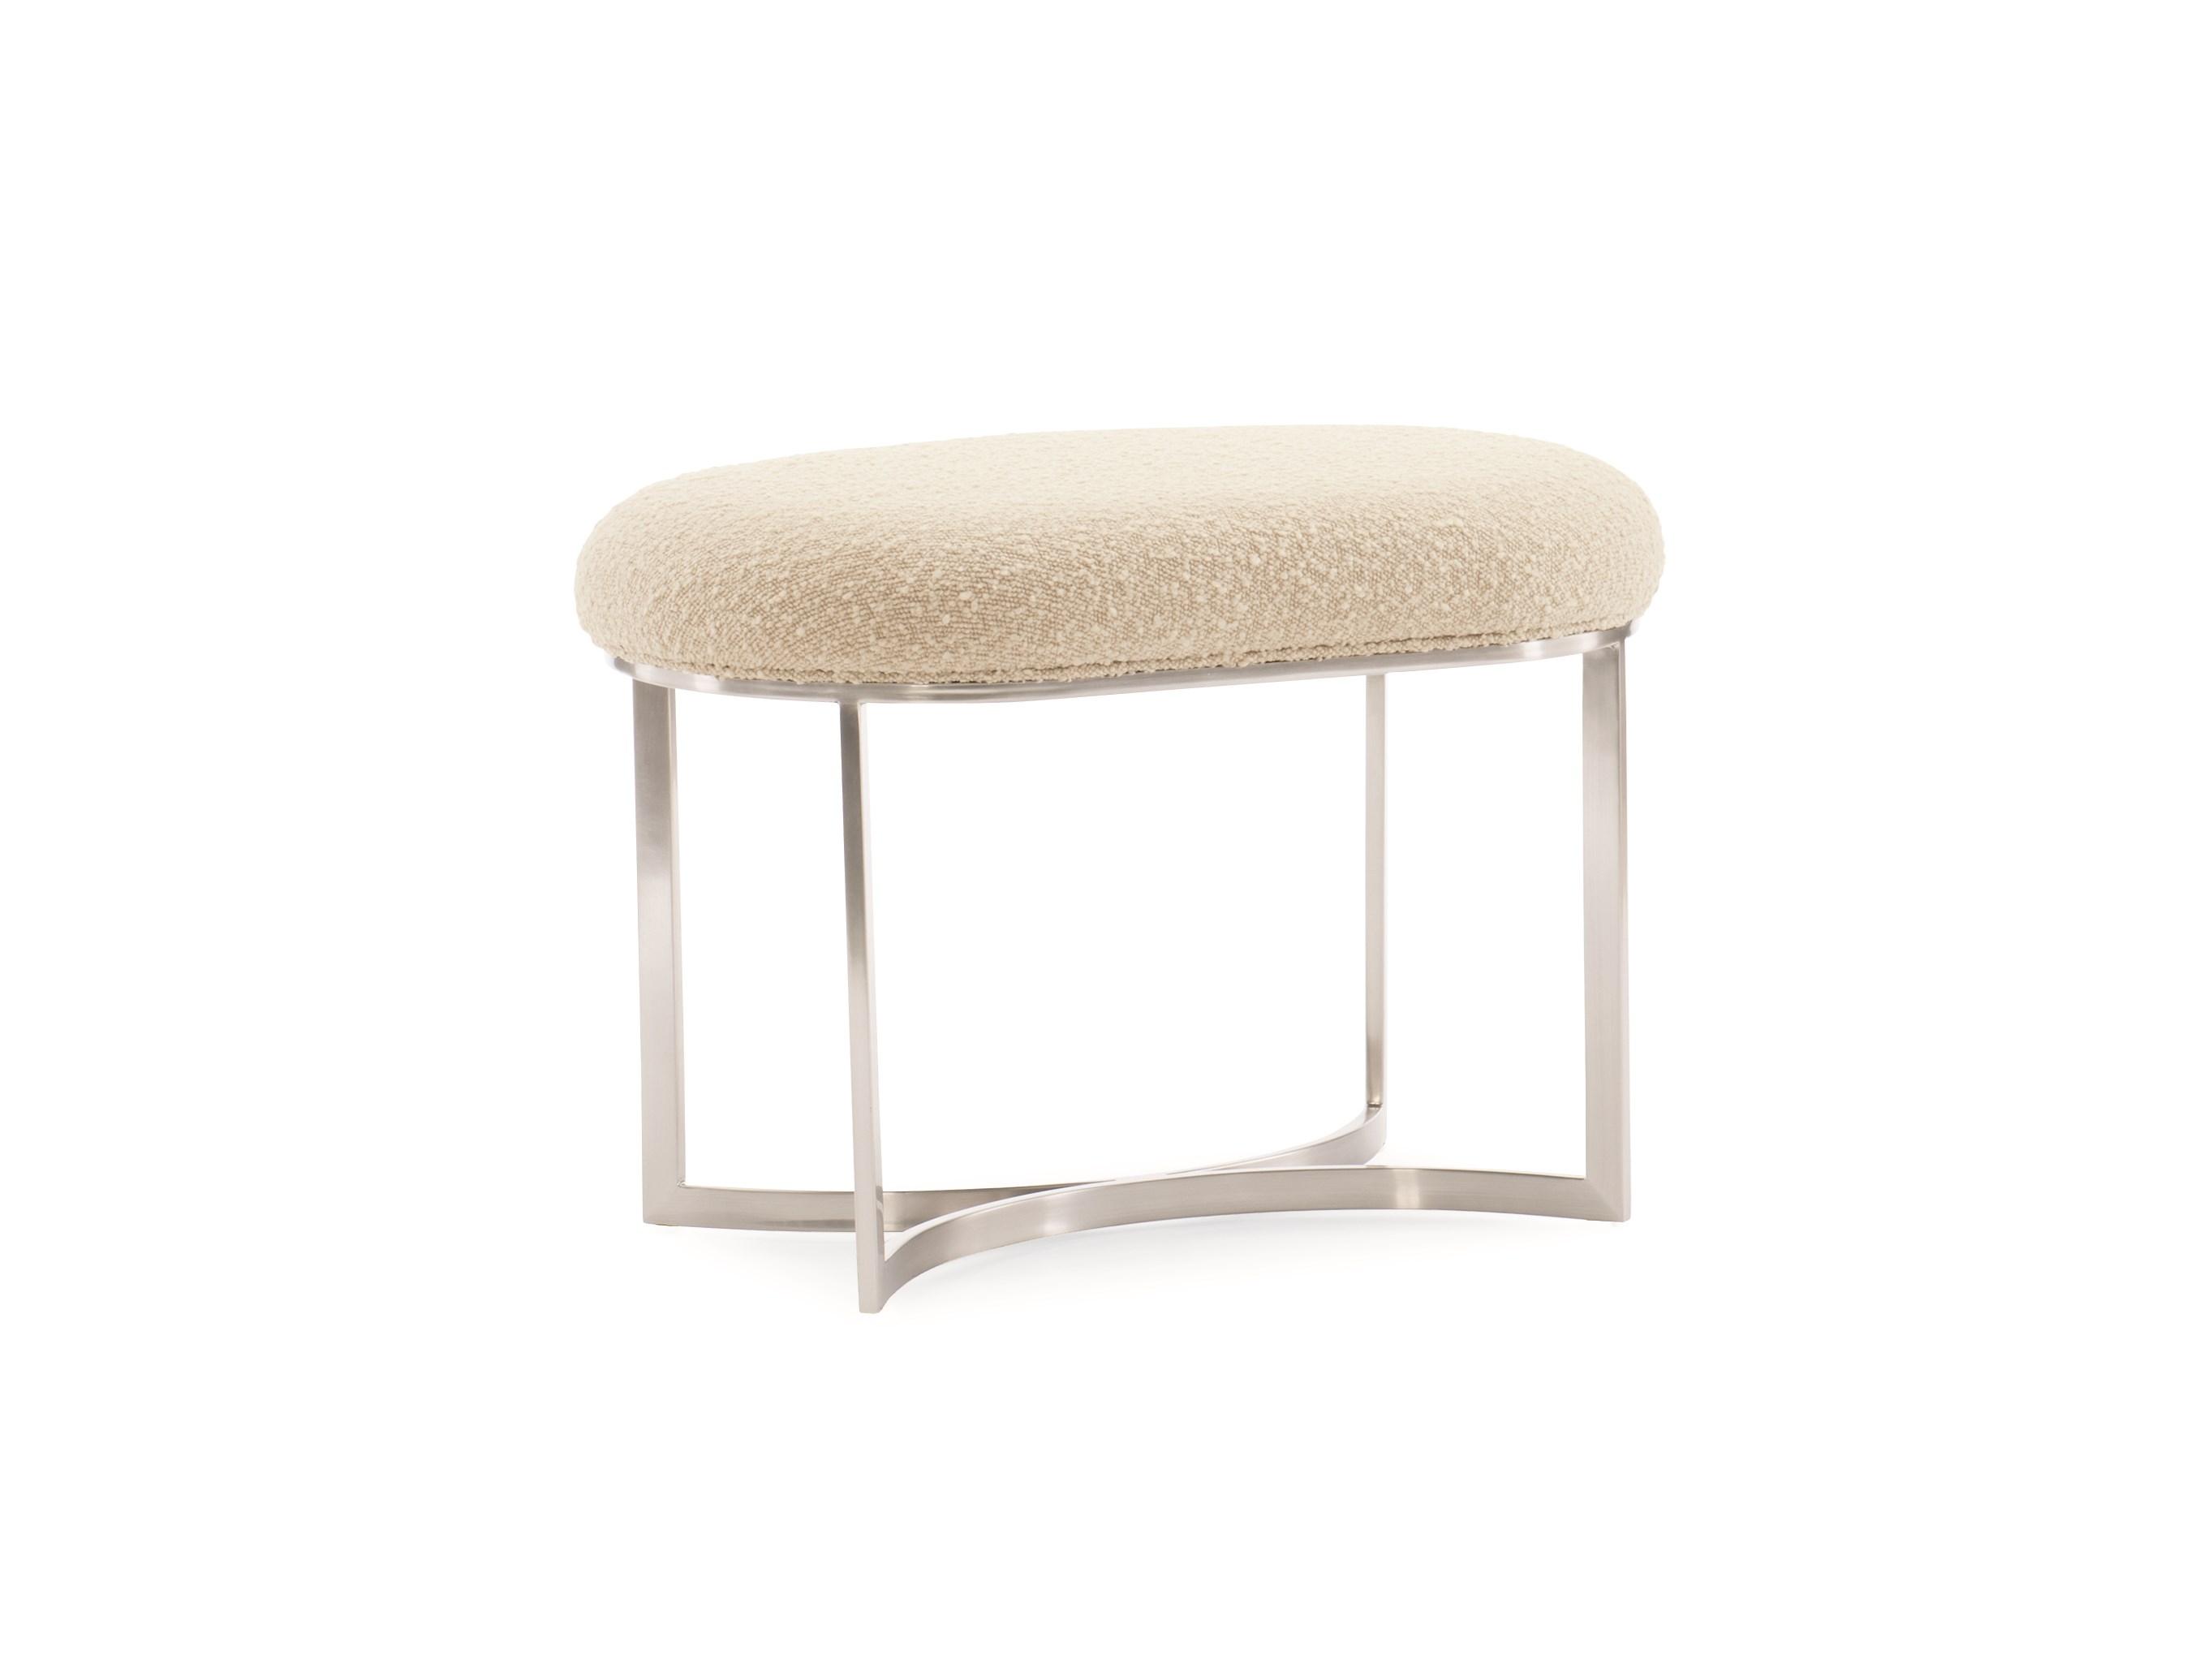 Fabulous Grace Bed Bench Caracole Inzonedesignstudio Interior Chair Design Inzonedesignstudiocom